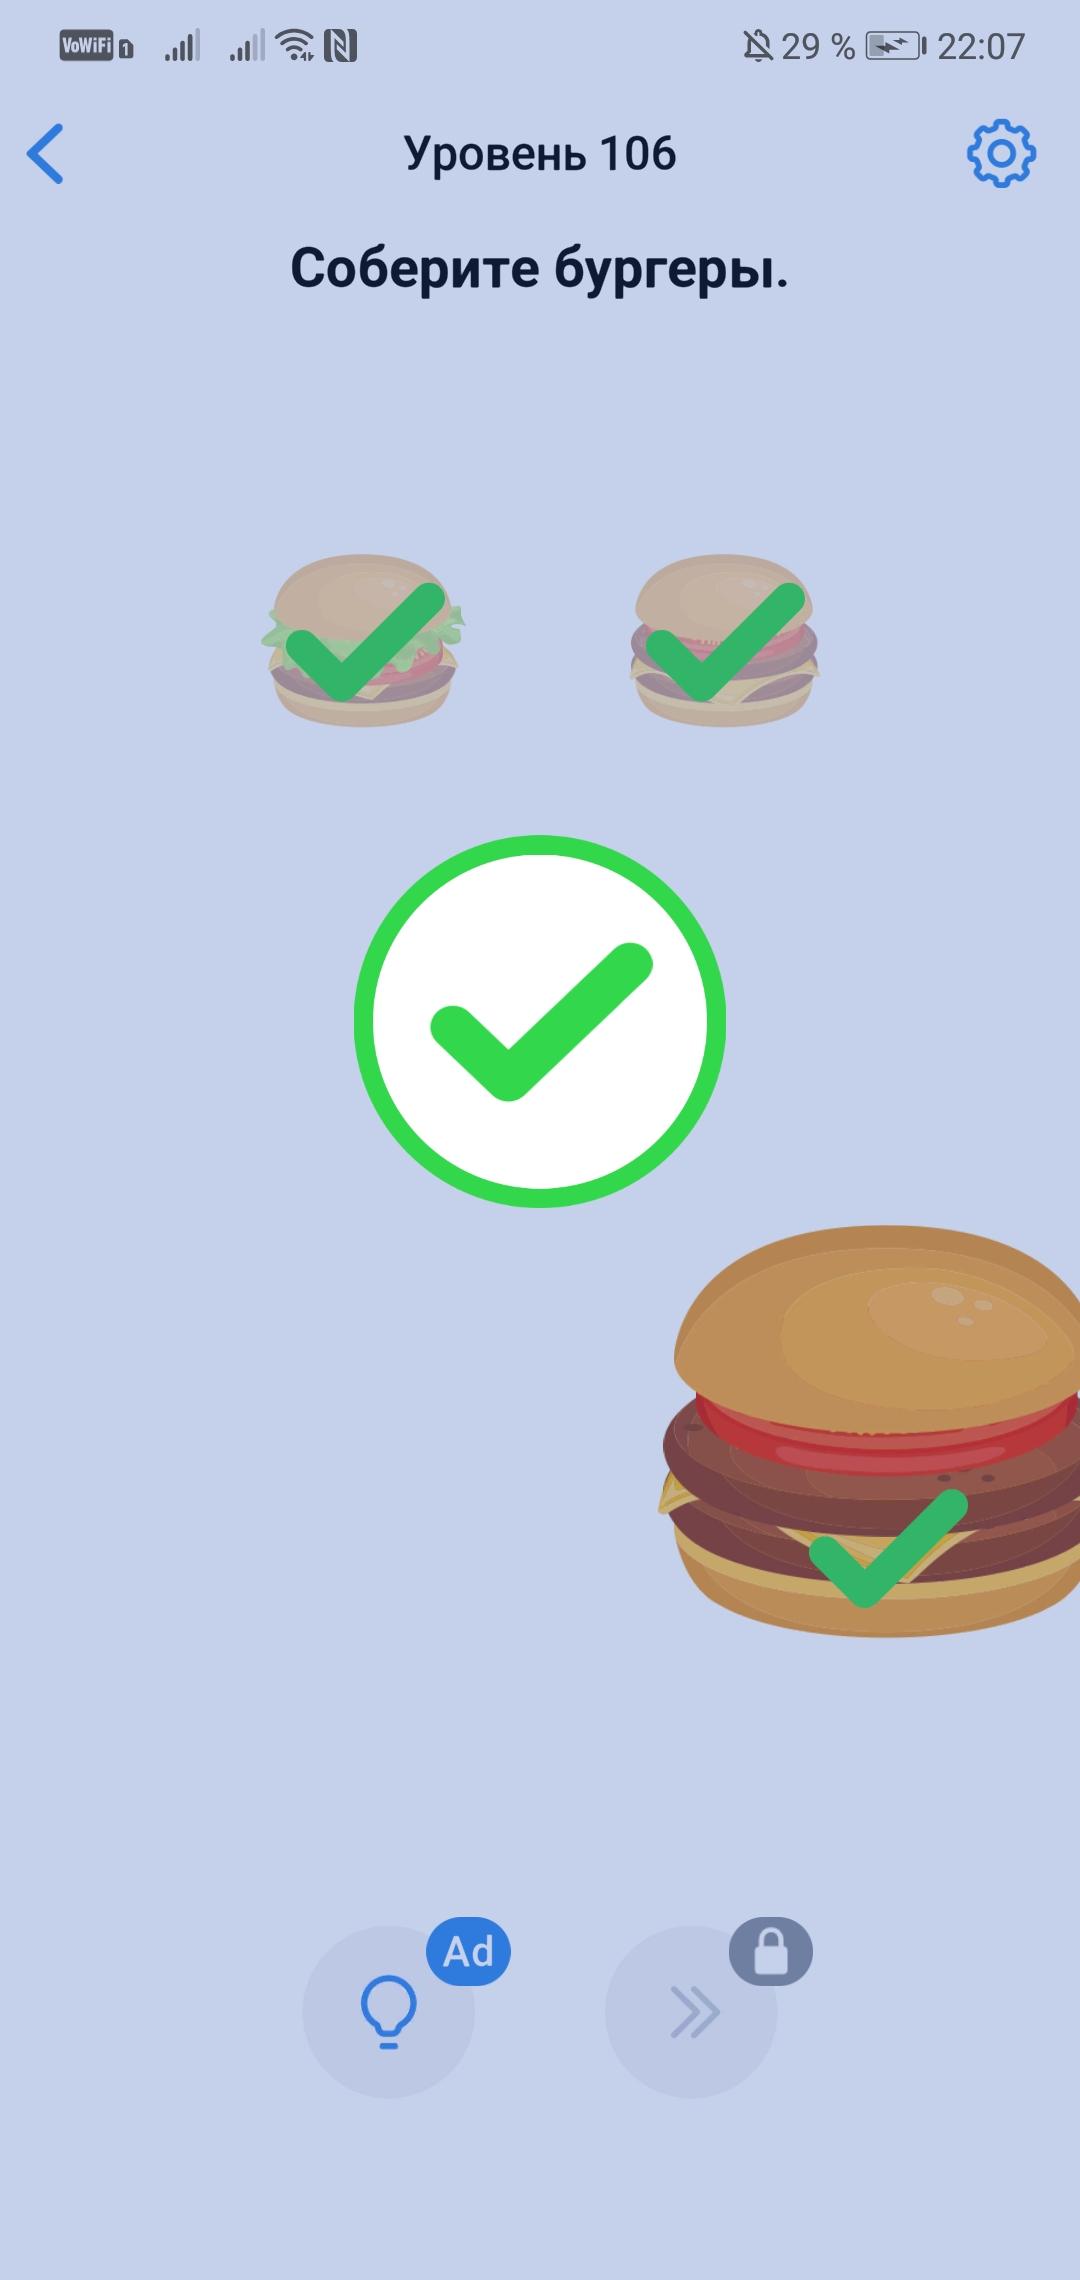 Easy Game - 106 уровень - Соберите бургеры.